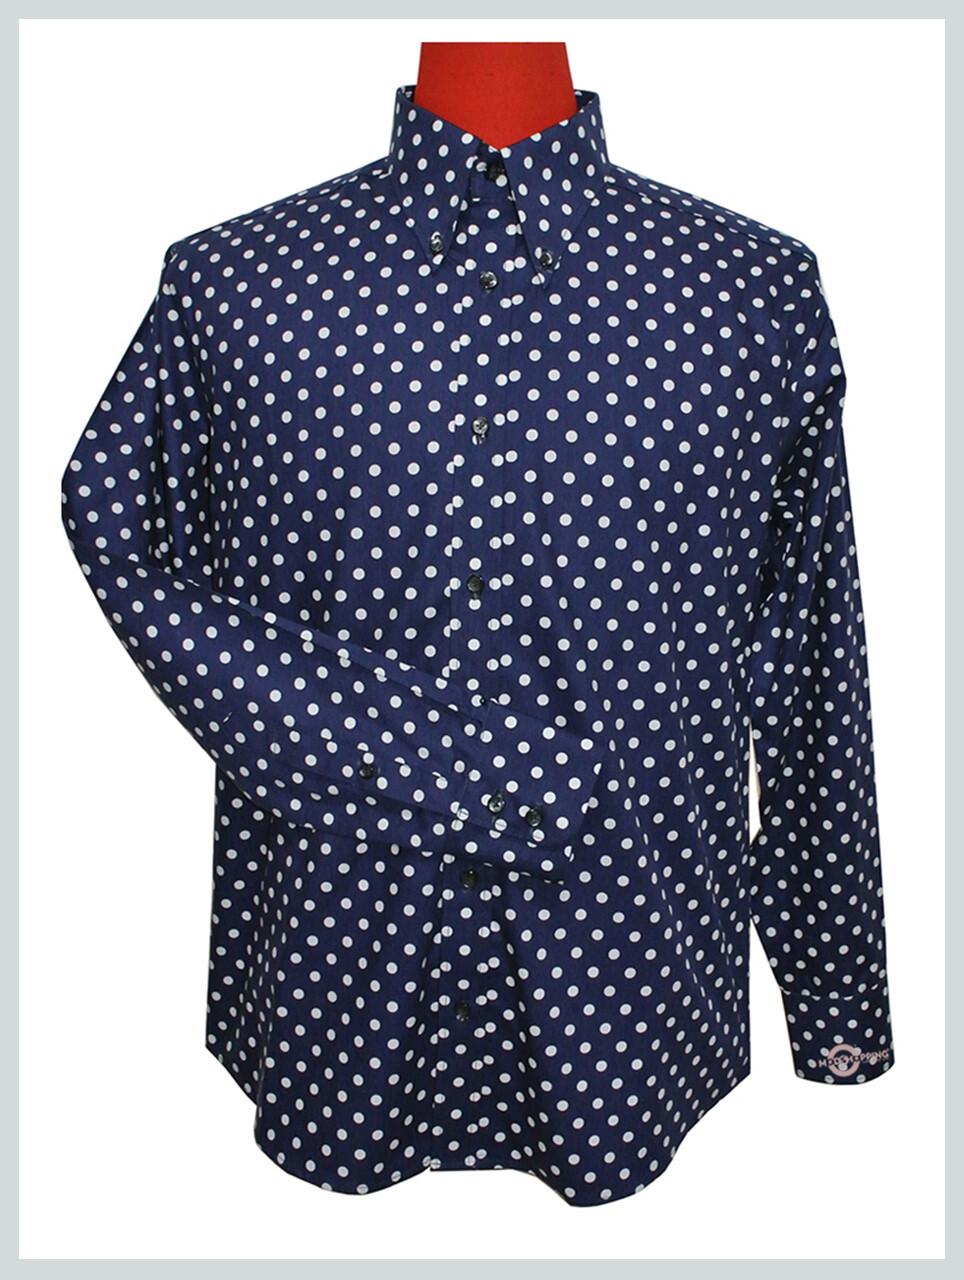 Polka Dot Shirt| Mens Slim Small White Dot Navy Blue Colour Shirt